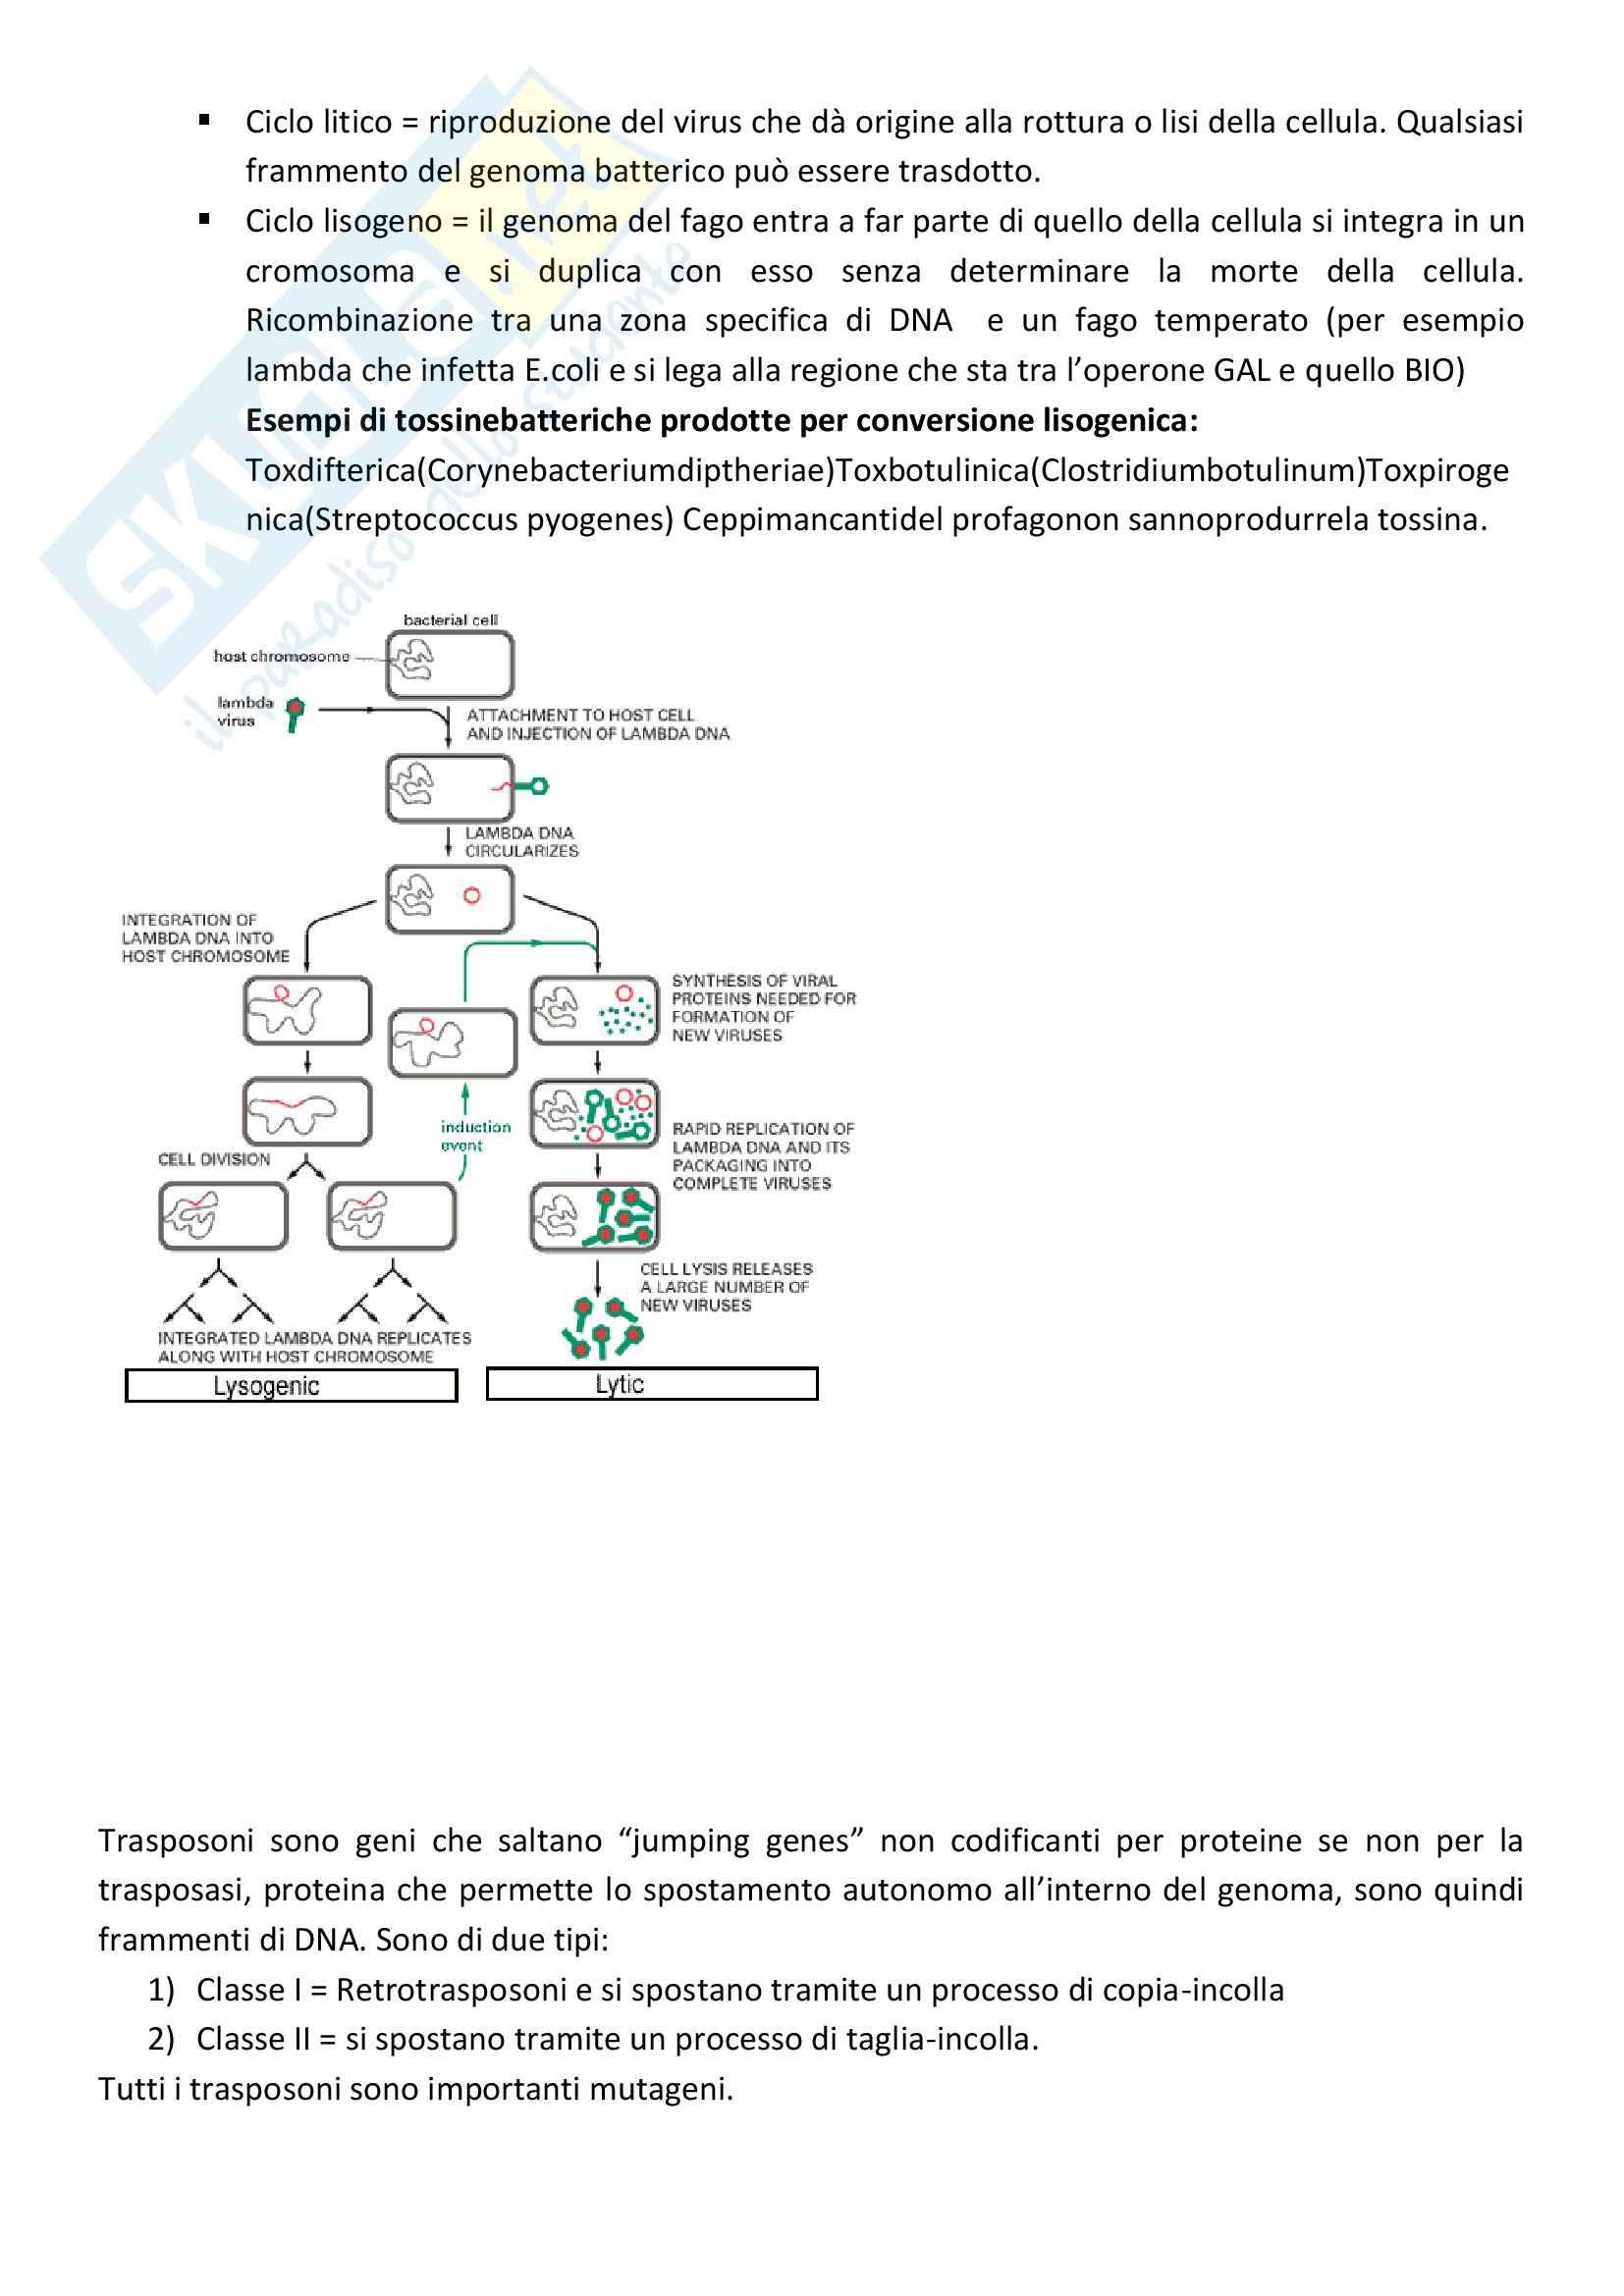 Microbiologia - Appunti Pag. 16